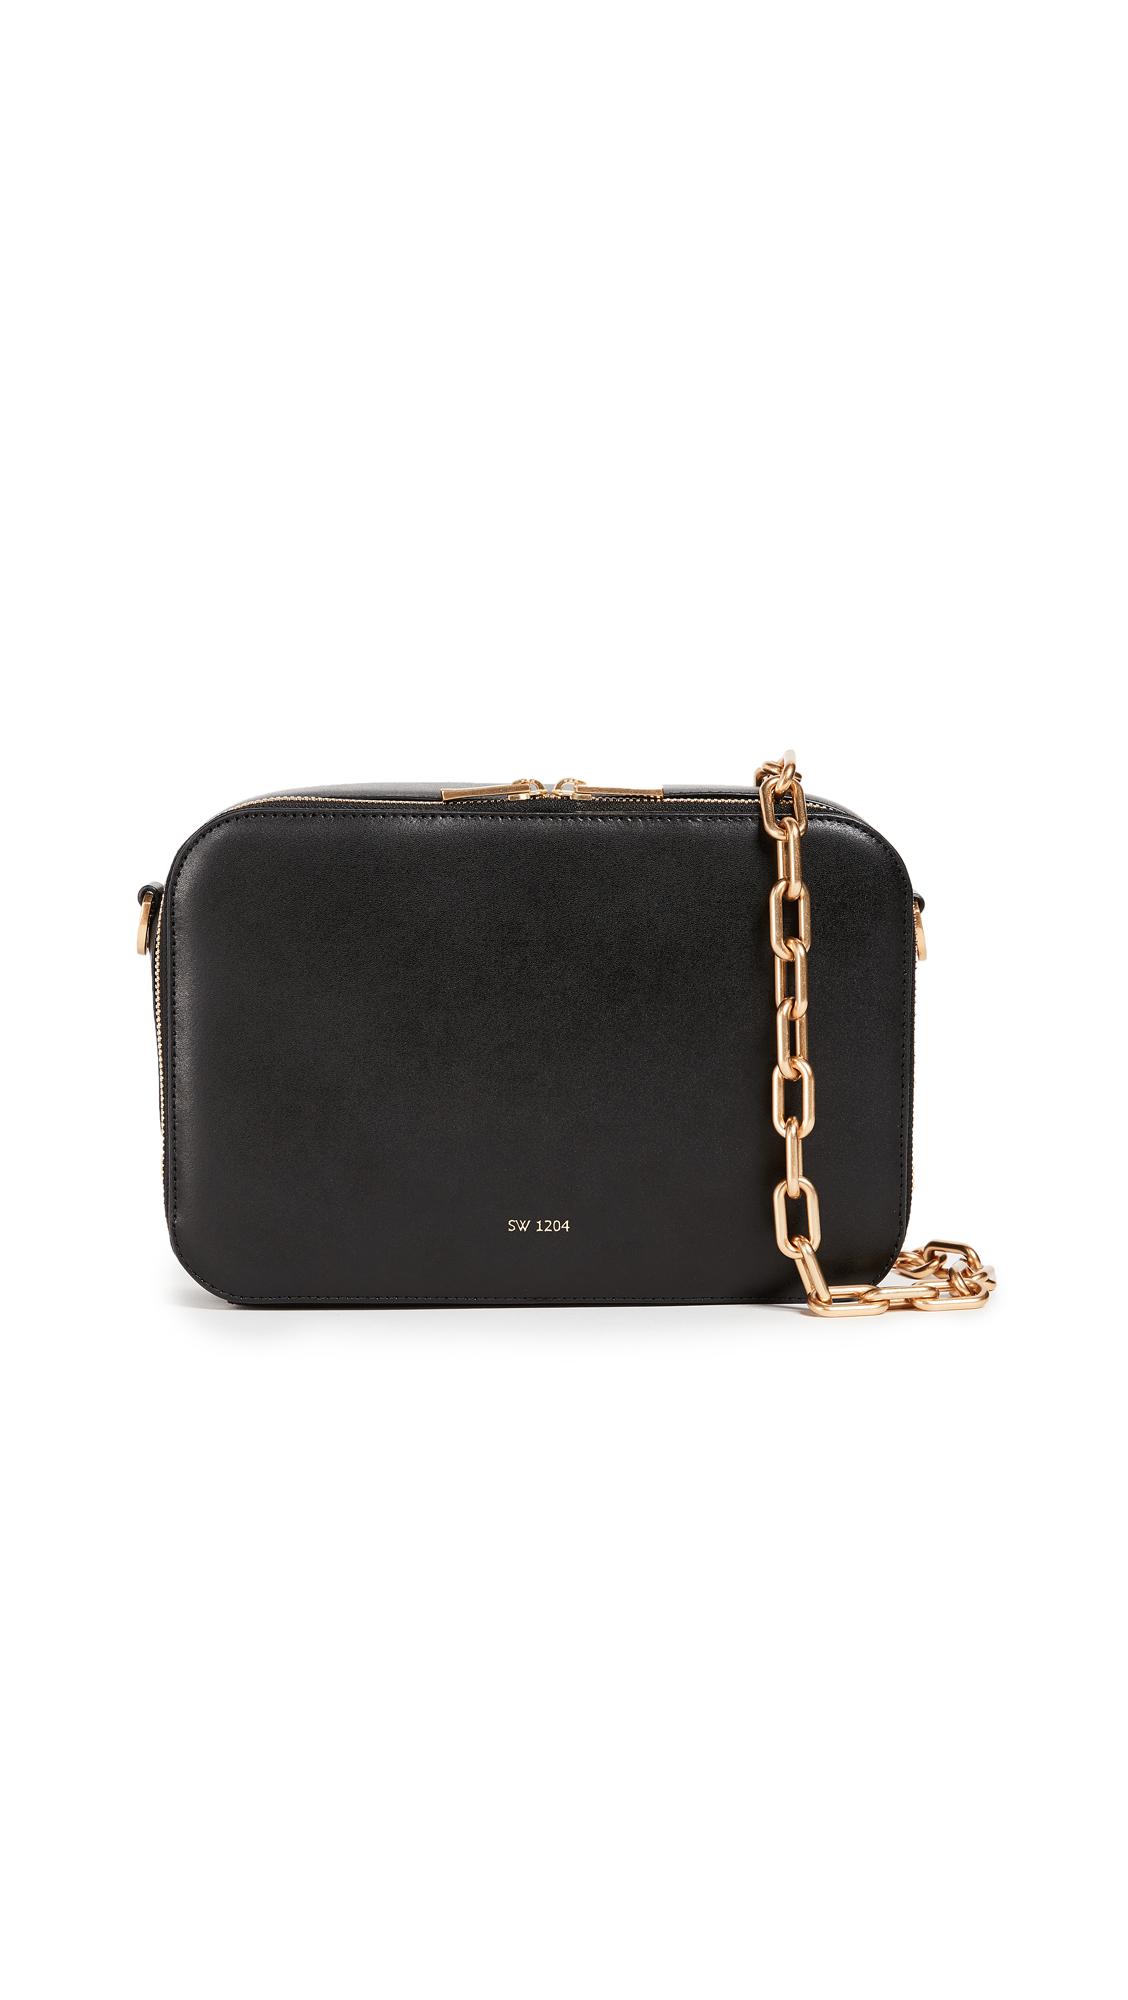 Sarah White Double Zip Cross Body Bag - Black